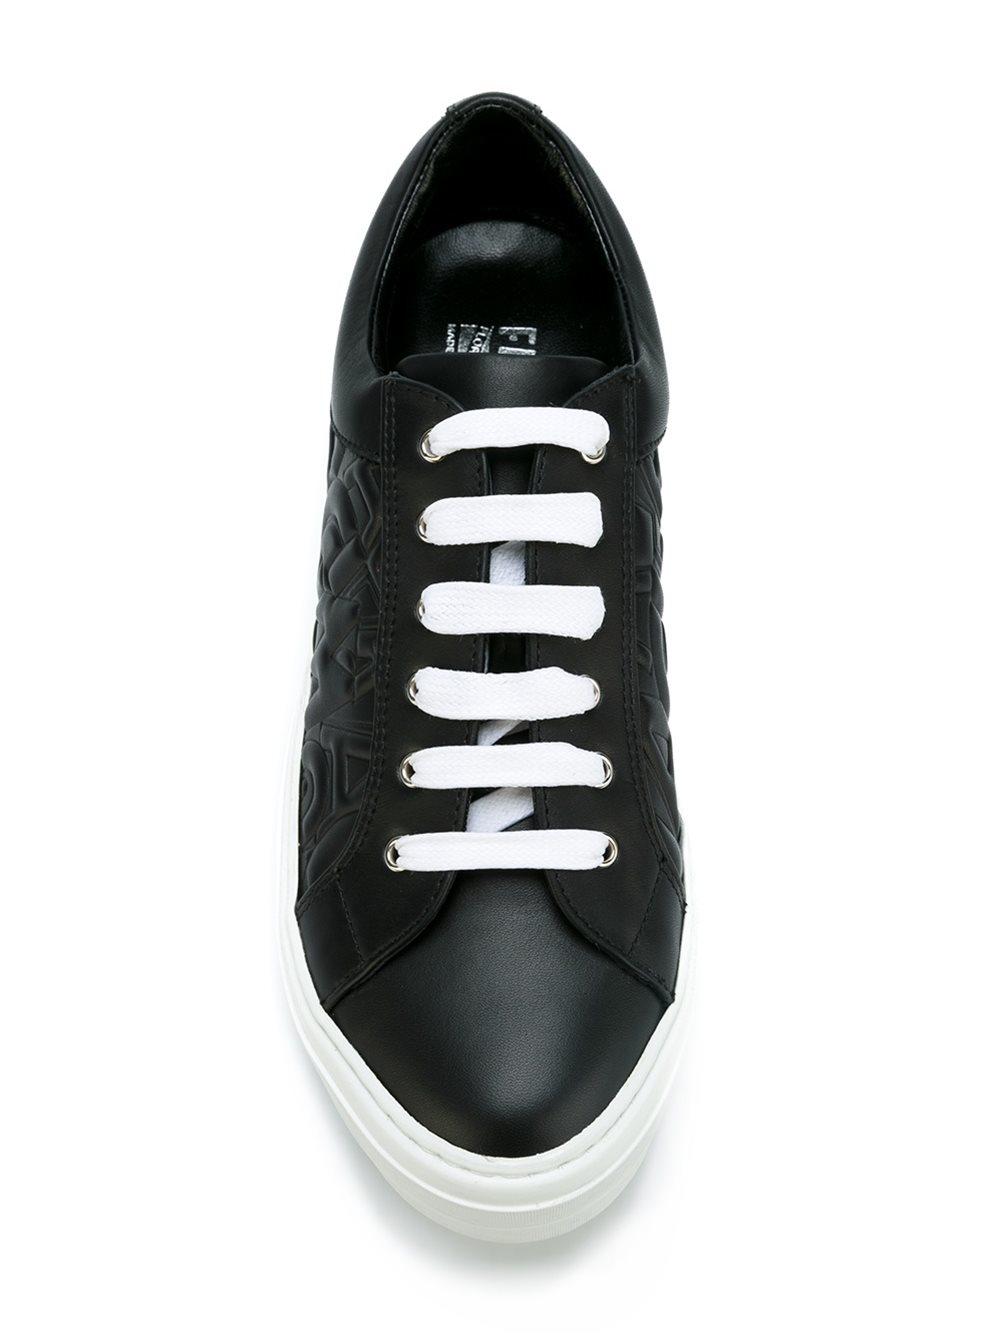 Ferragamo Leather 'Liu Let' Sneakers in Black (Brown)